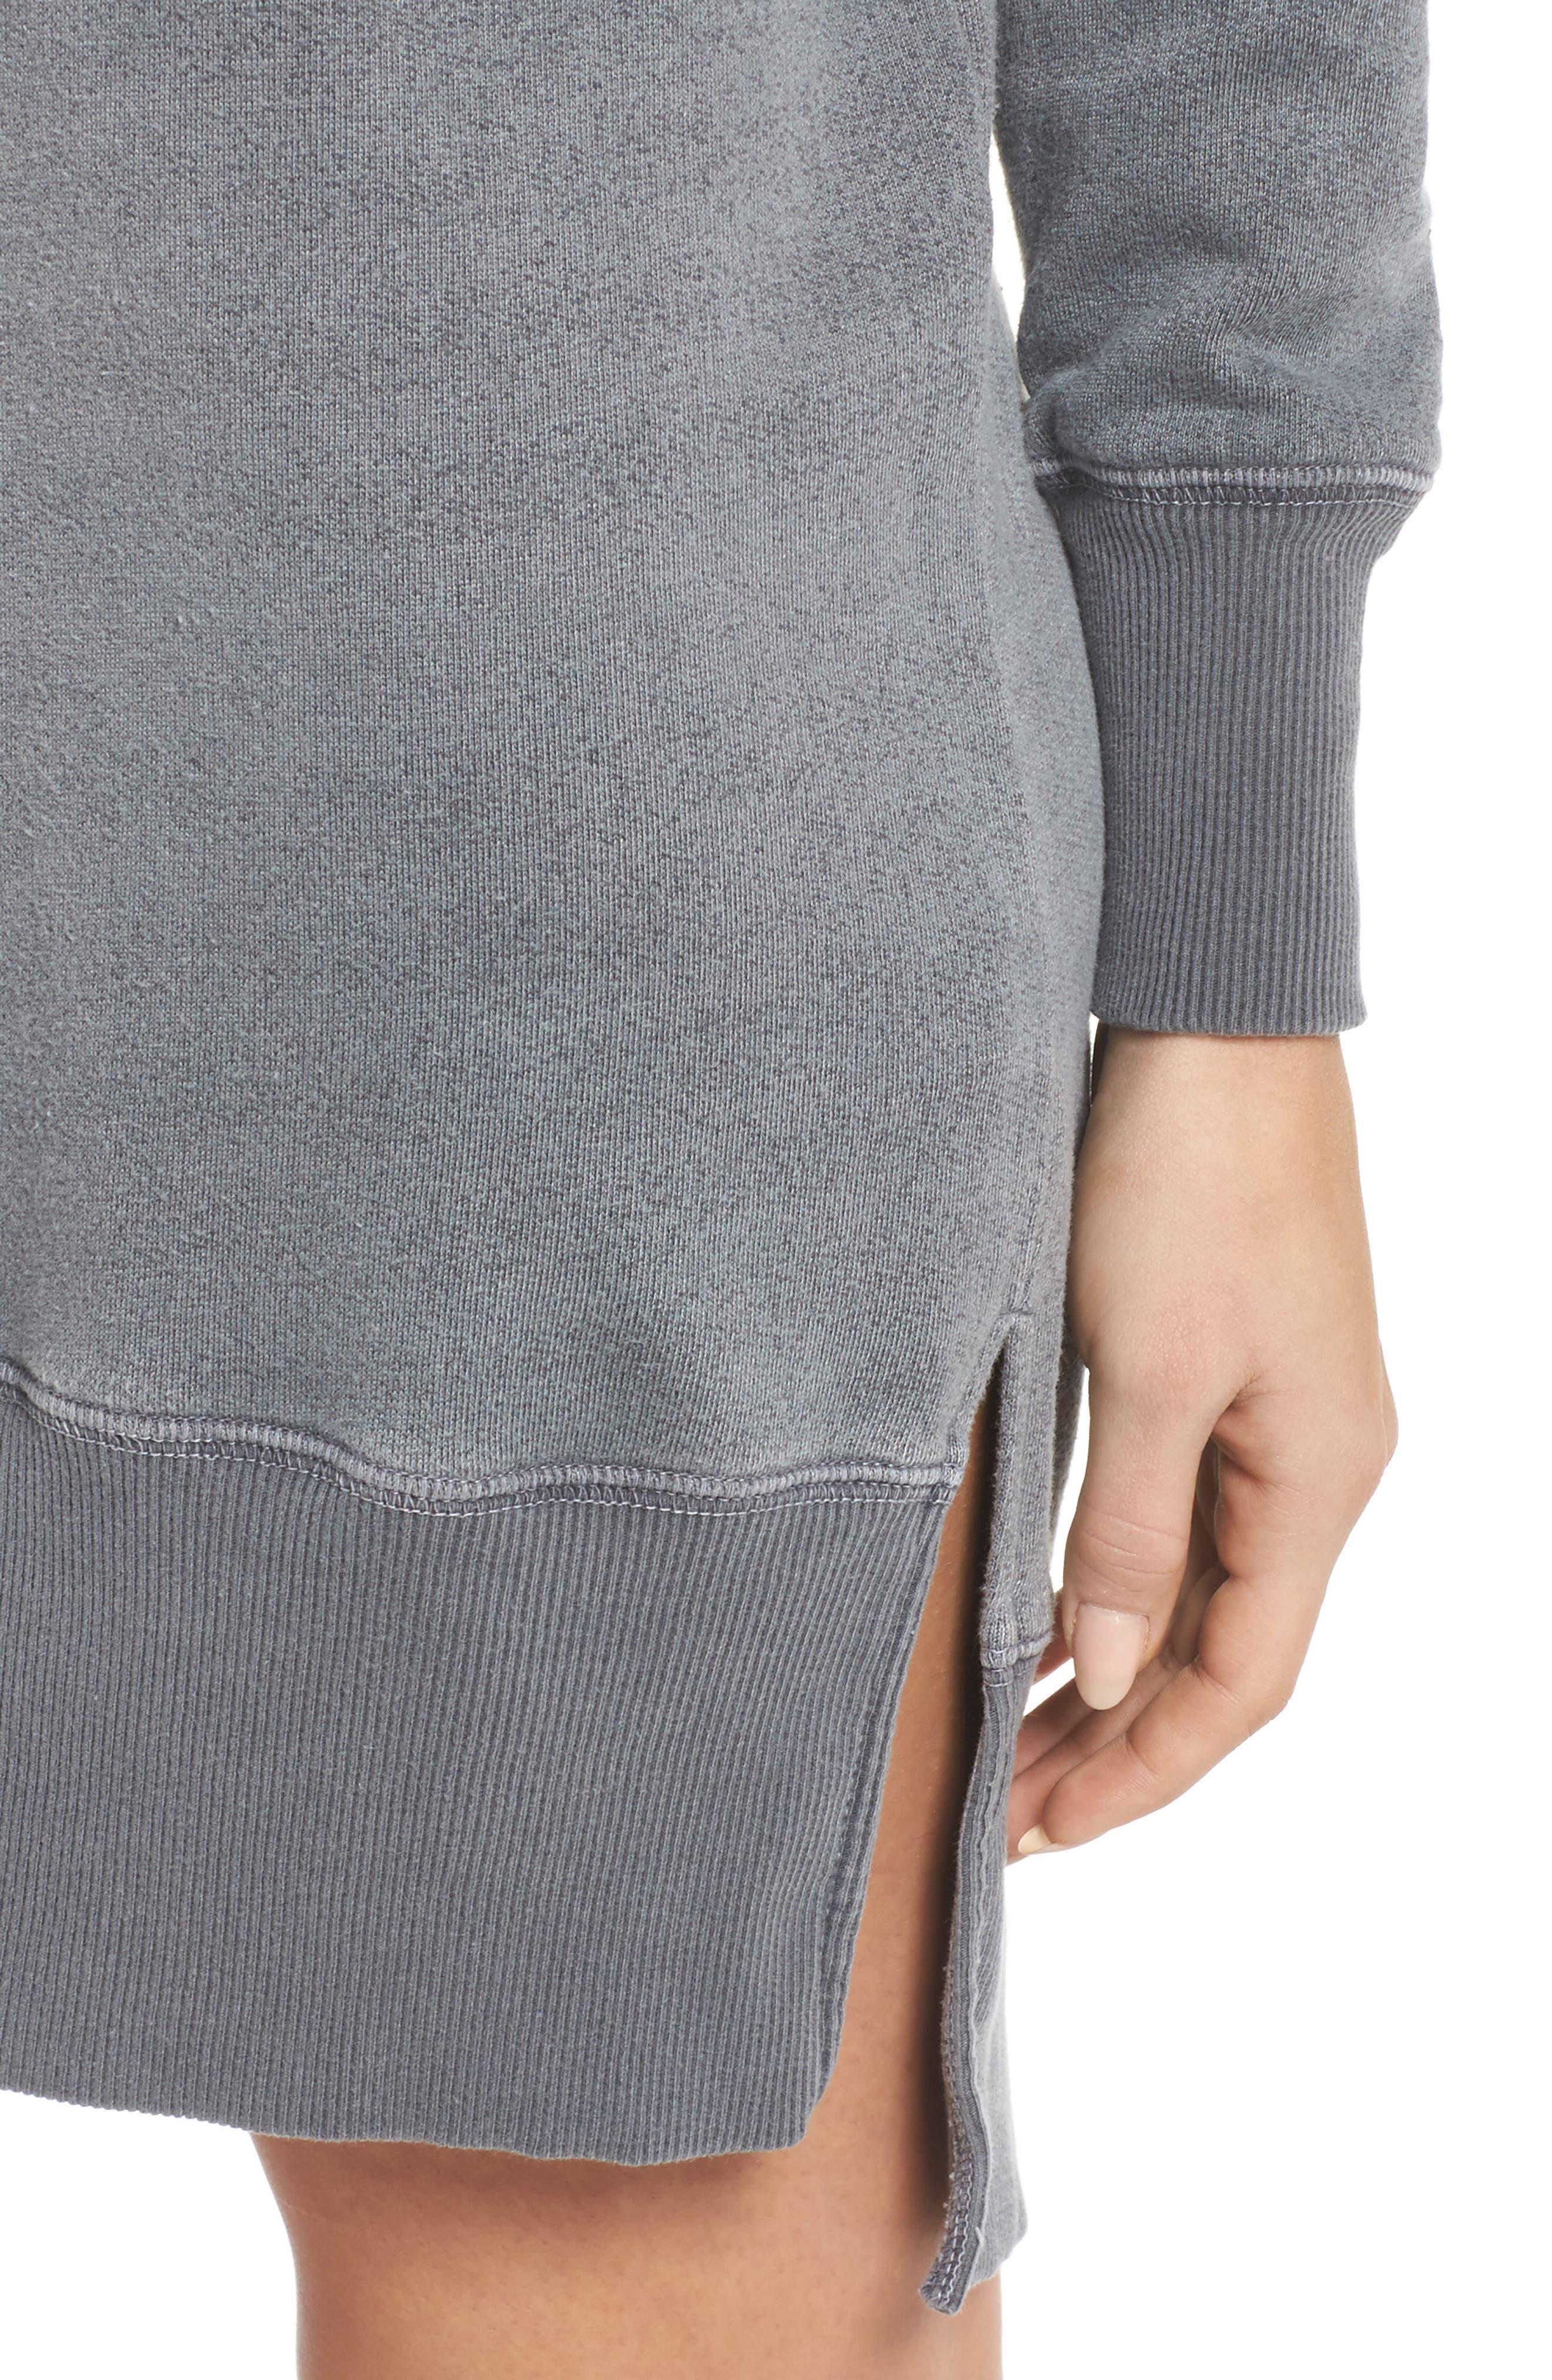 Lounge Sweatshirt Dress,                             Alternate thumbnail 5, color,                             Faded Black